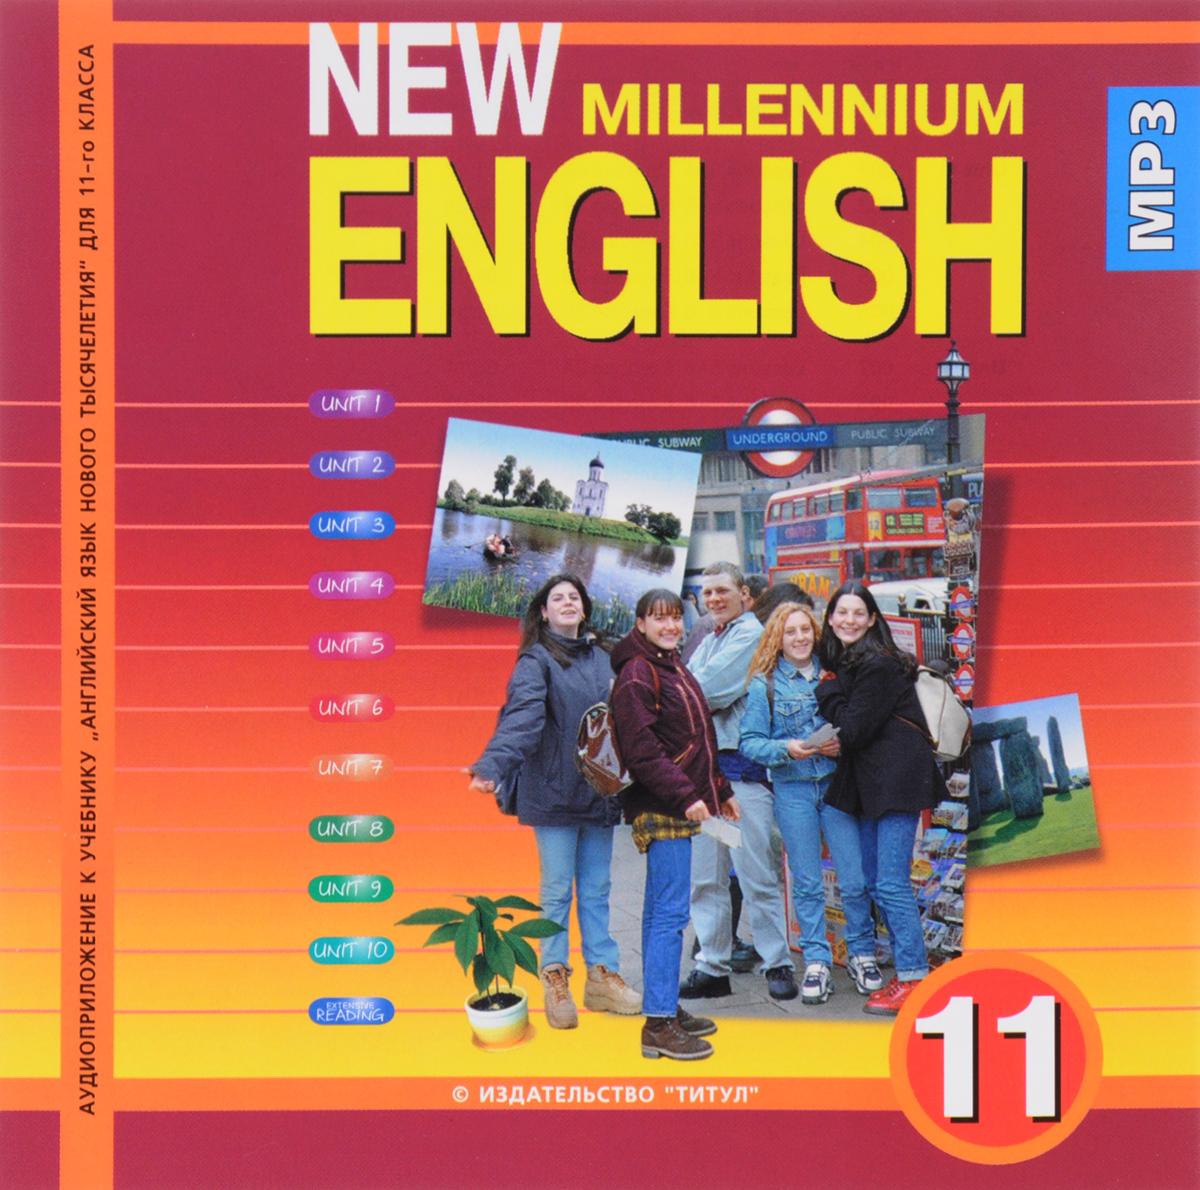 New Millennium English 11 / Английский язык. 11 класс (аудиокурс MP3) кочергина в к hauskasti suomea финский язык для школьников книга 1 аудиокурс mp3